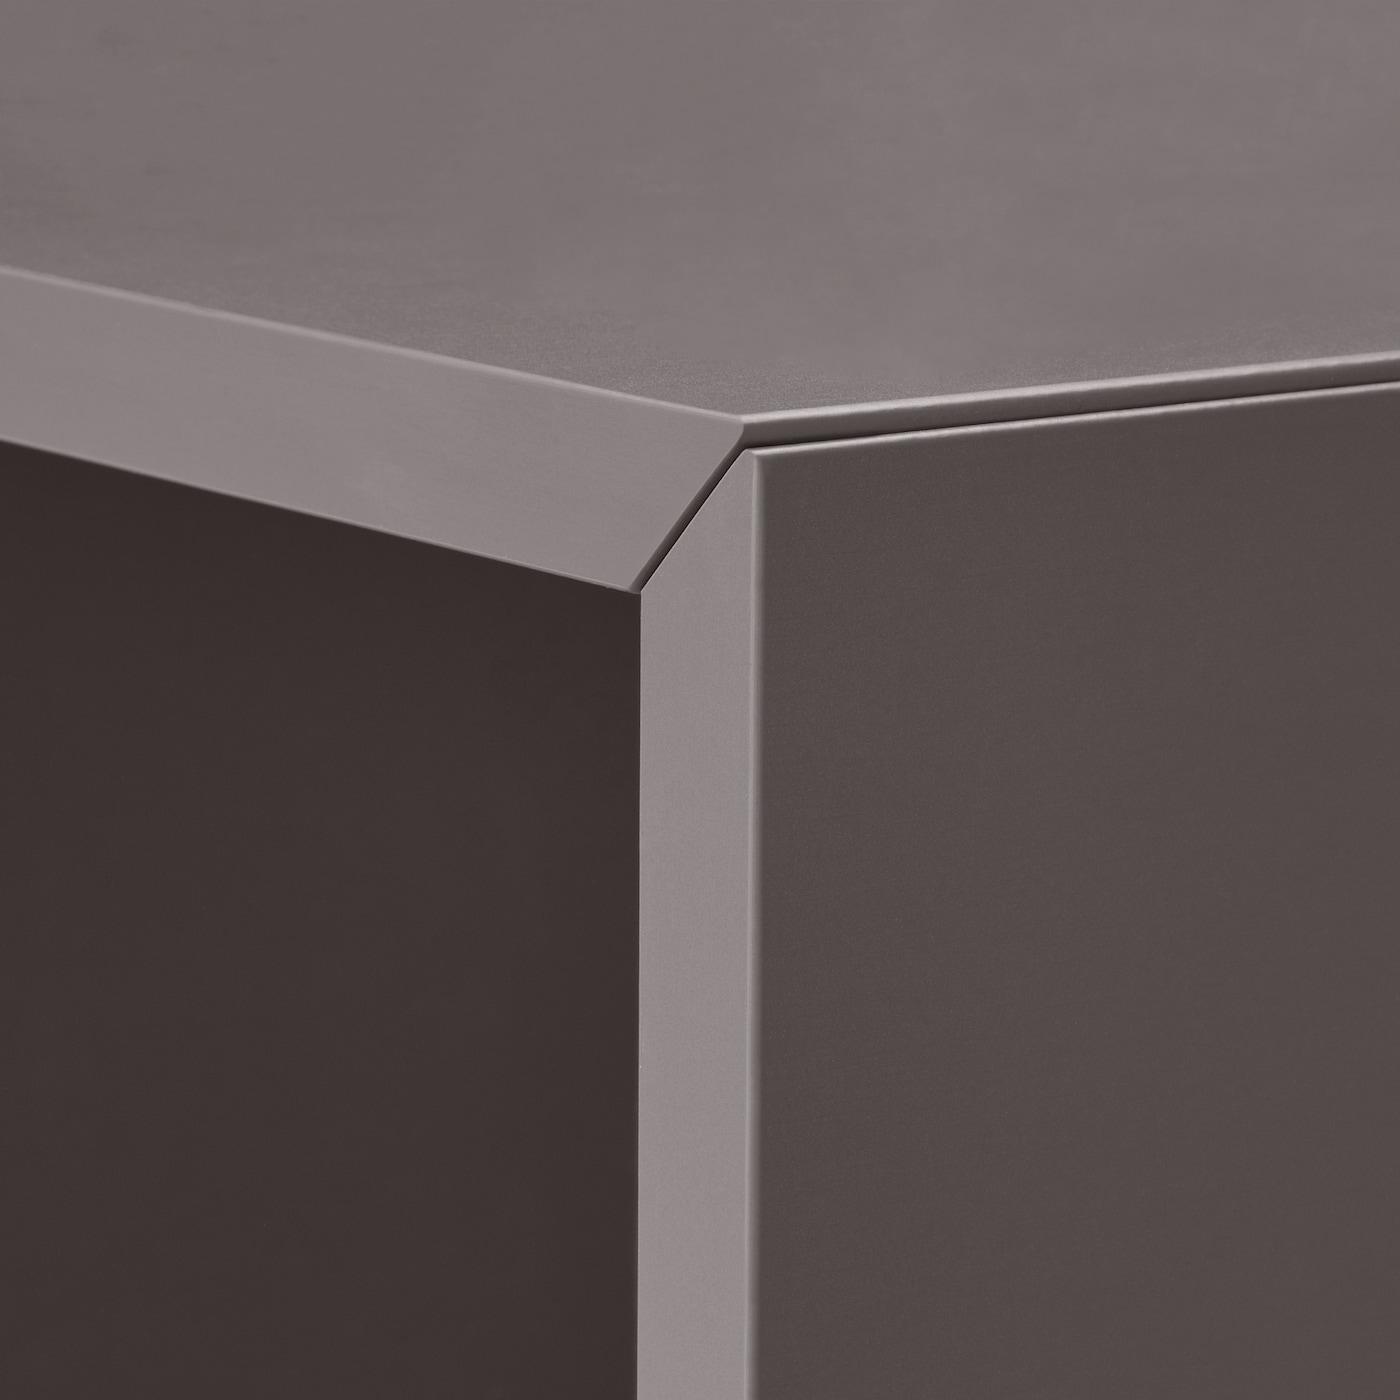 EKET Cabinet with 4 compartments, dark grey, 70x35x70 cm